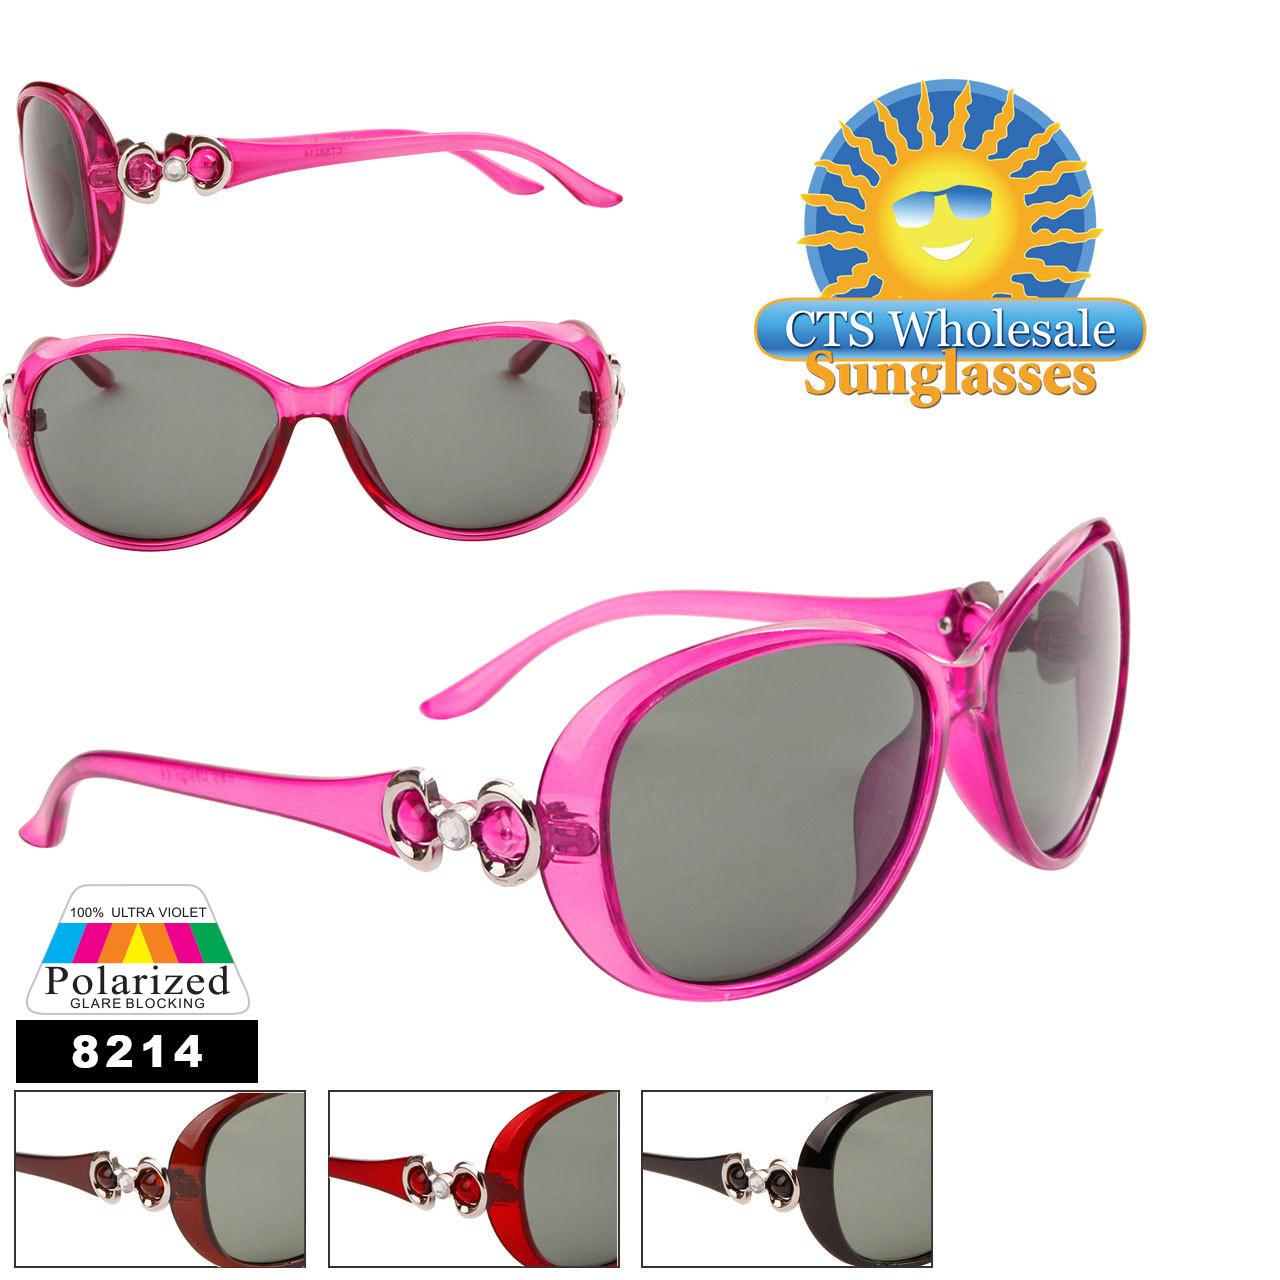 Women's Polarized Sunglasses in Bulk - 8214